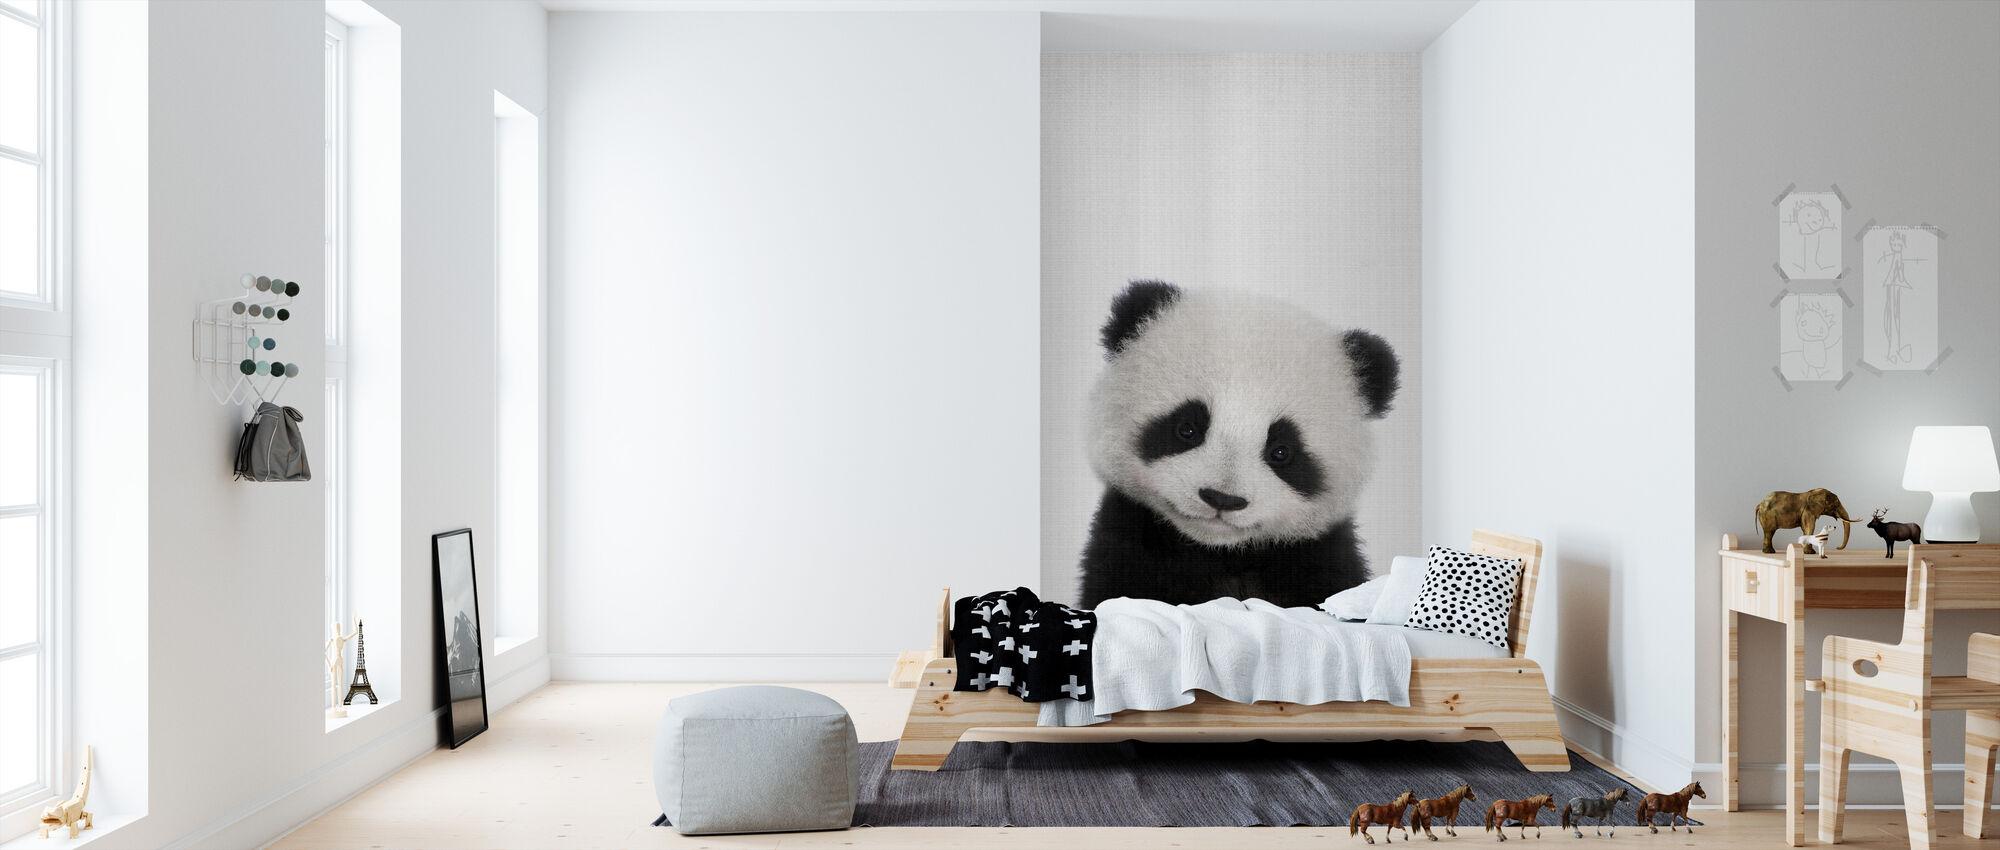 Panda - Tapet - Barnerom